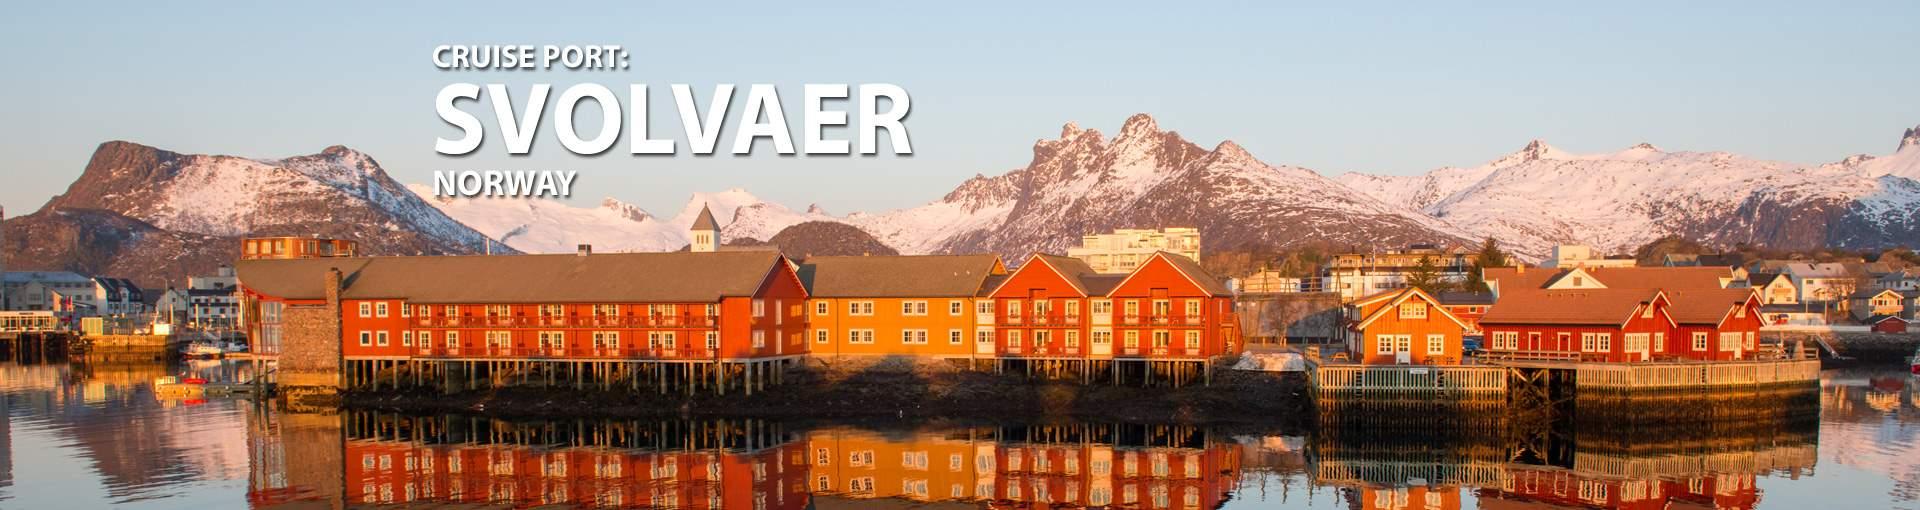 Cruises to Svolvaer, Norway